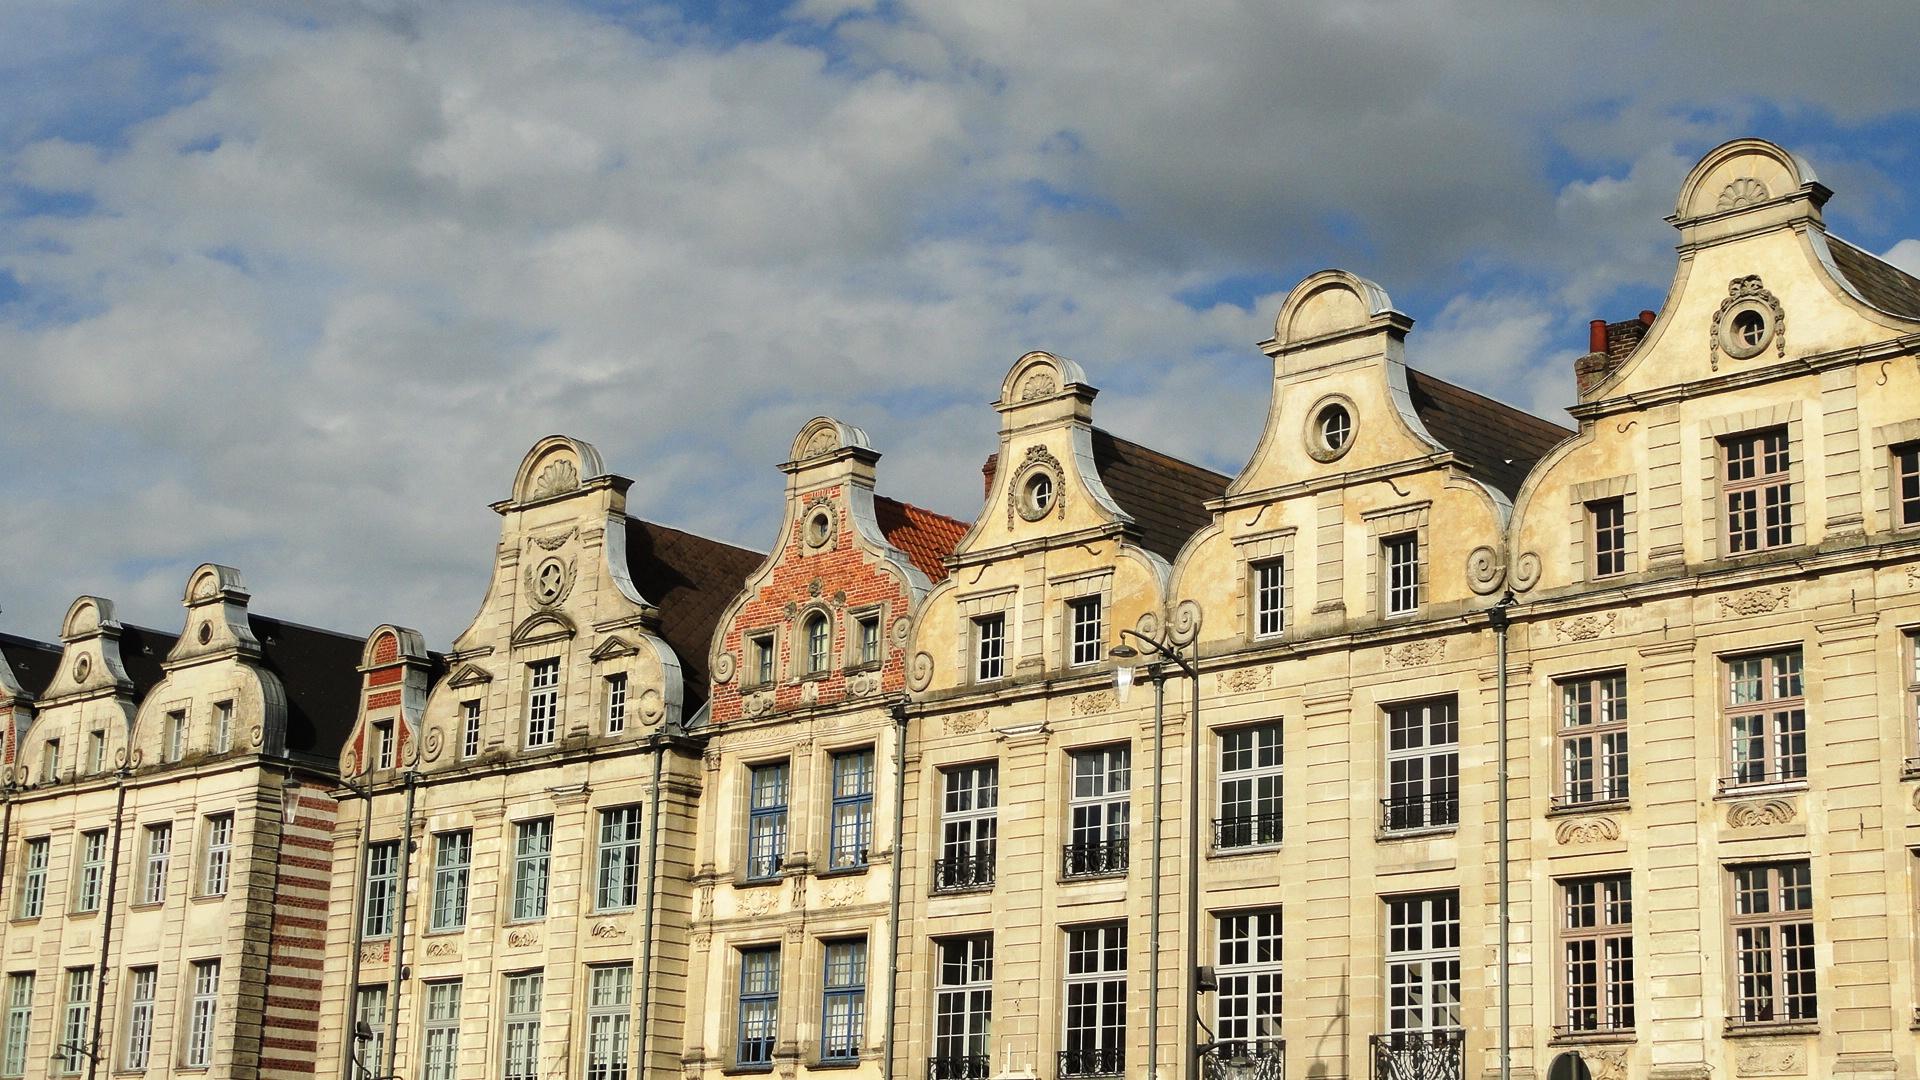 Arras - Place des Héros - Façades